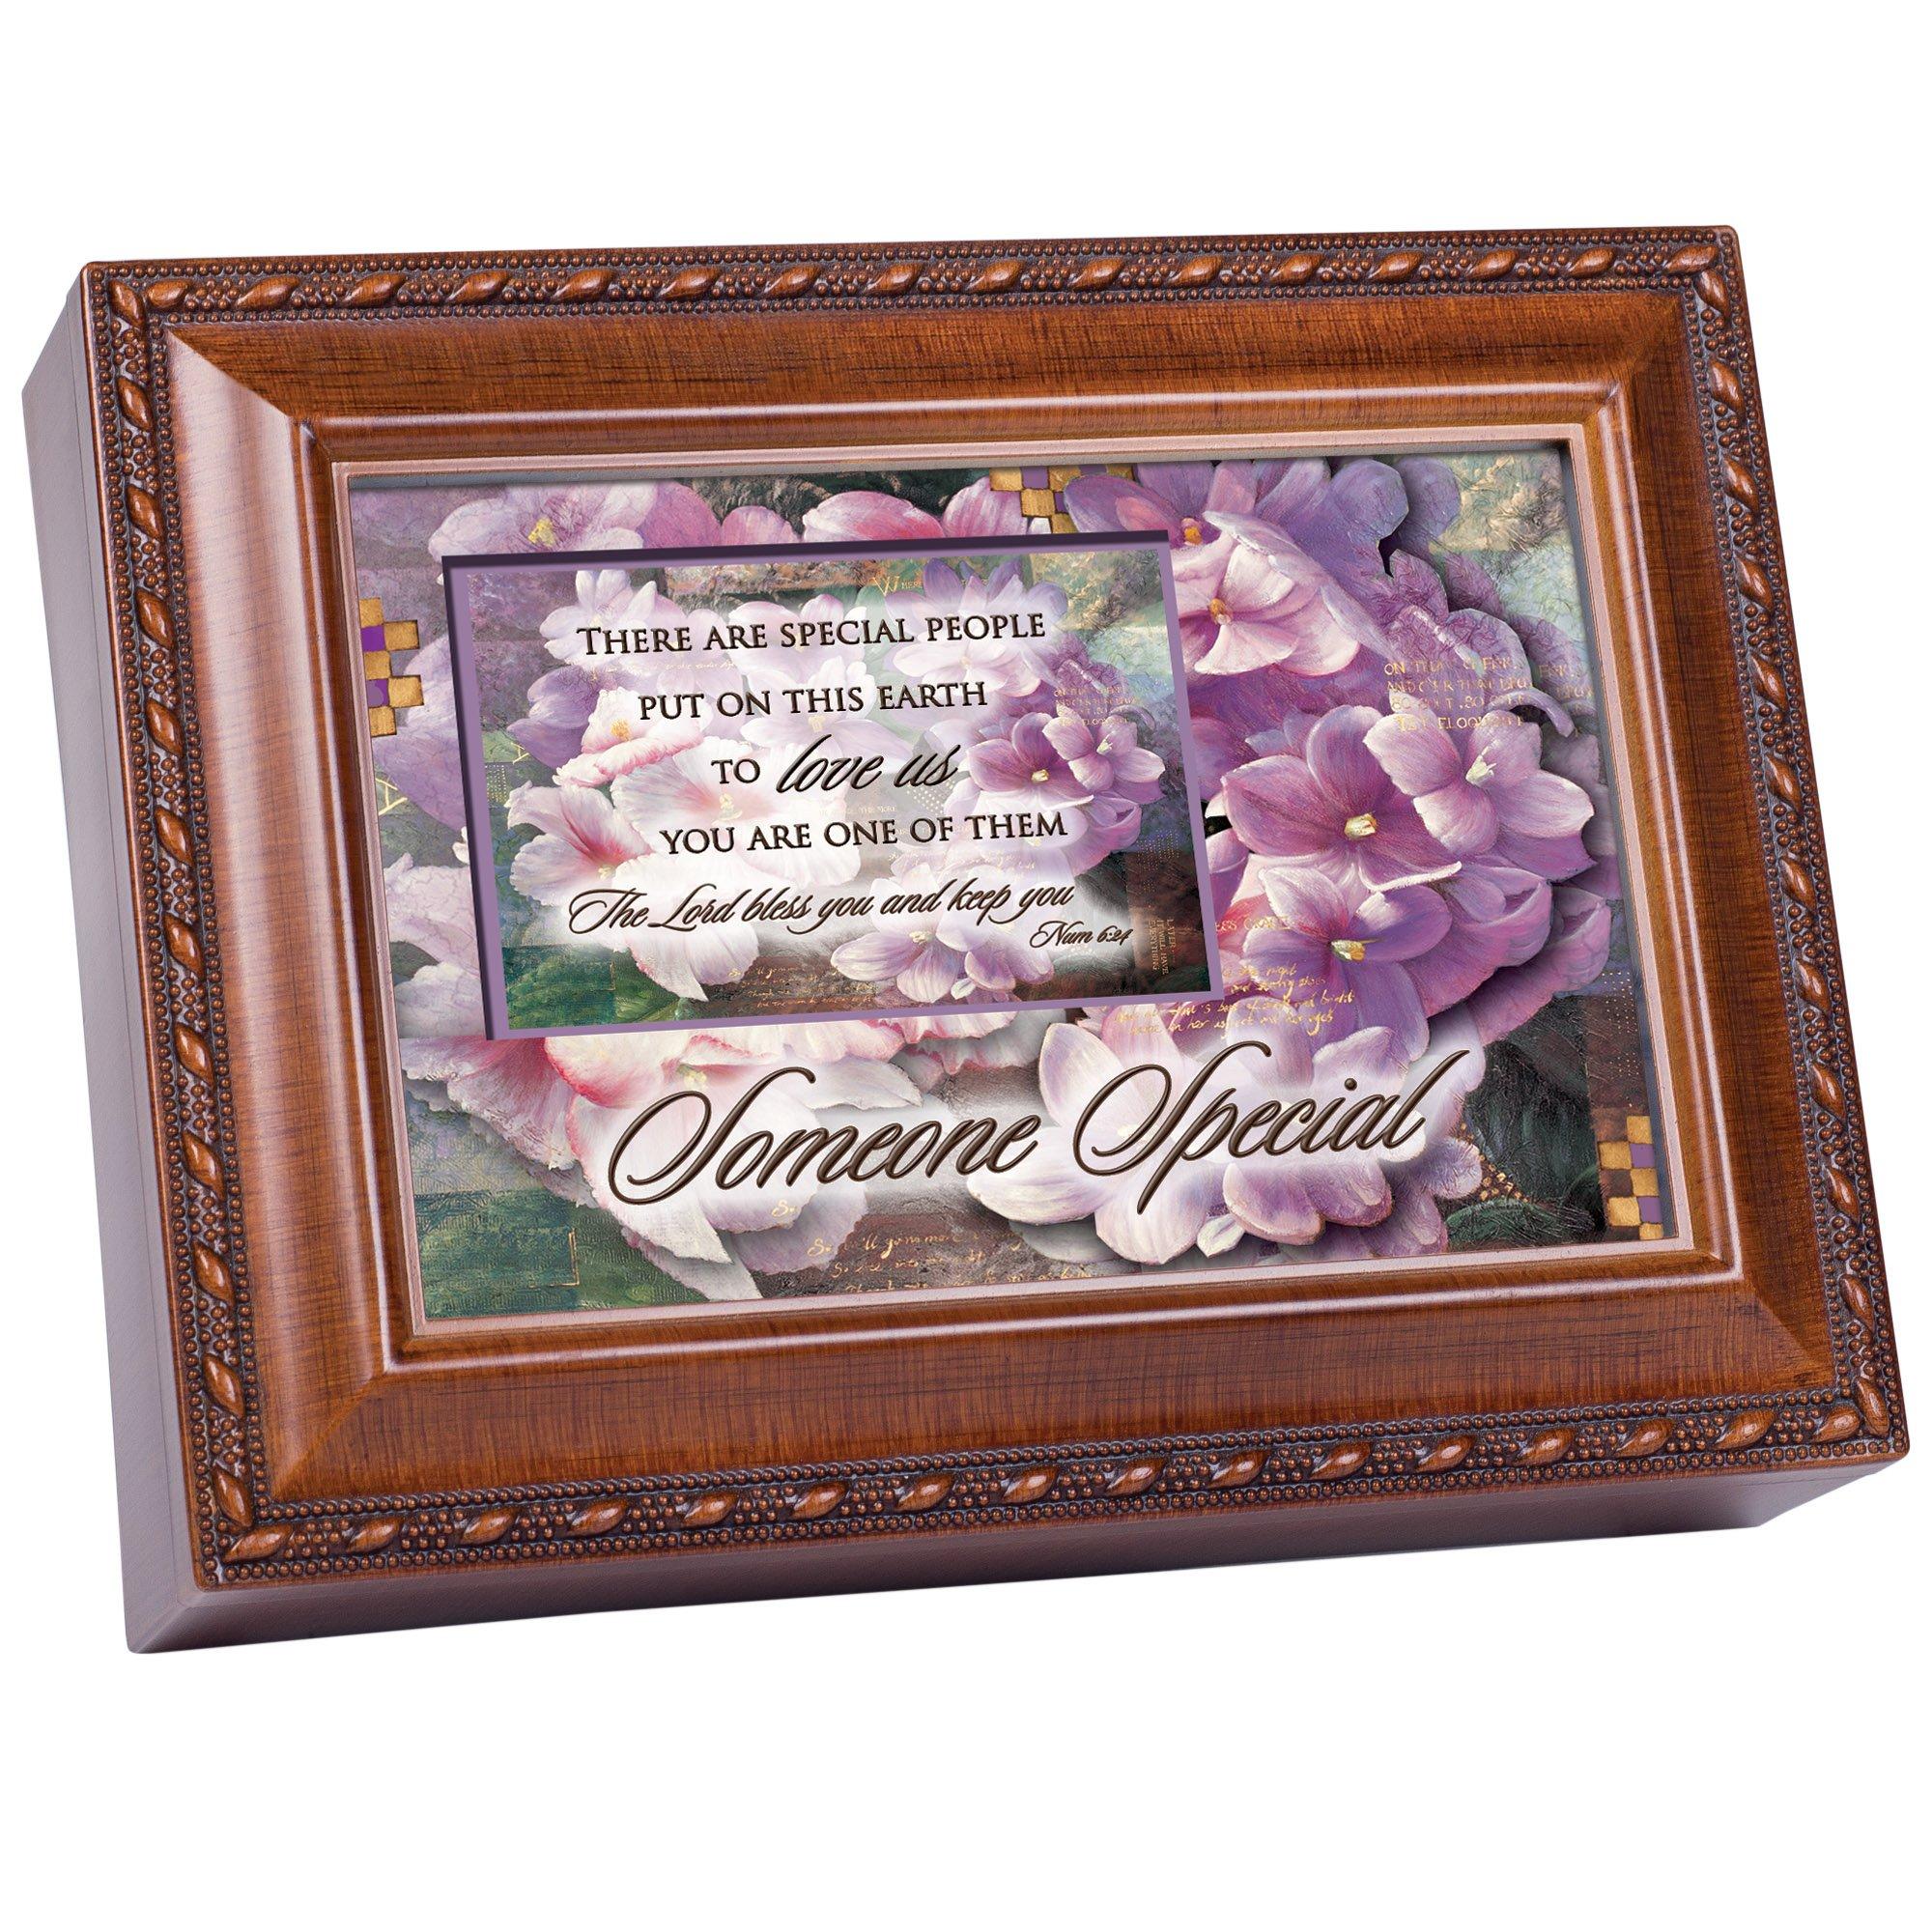 Cottage Garden Someone Special Woodgrain Music Box/Jewelry Box Plays Friend In Jesus